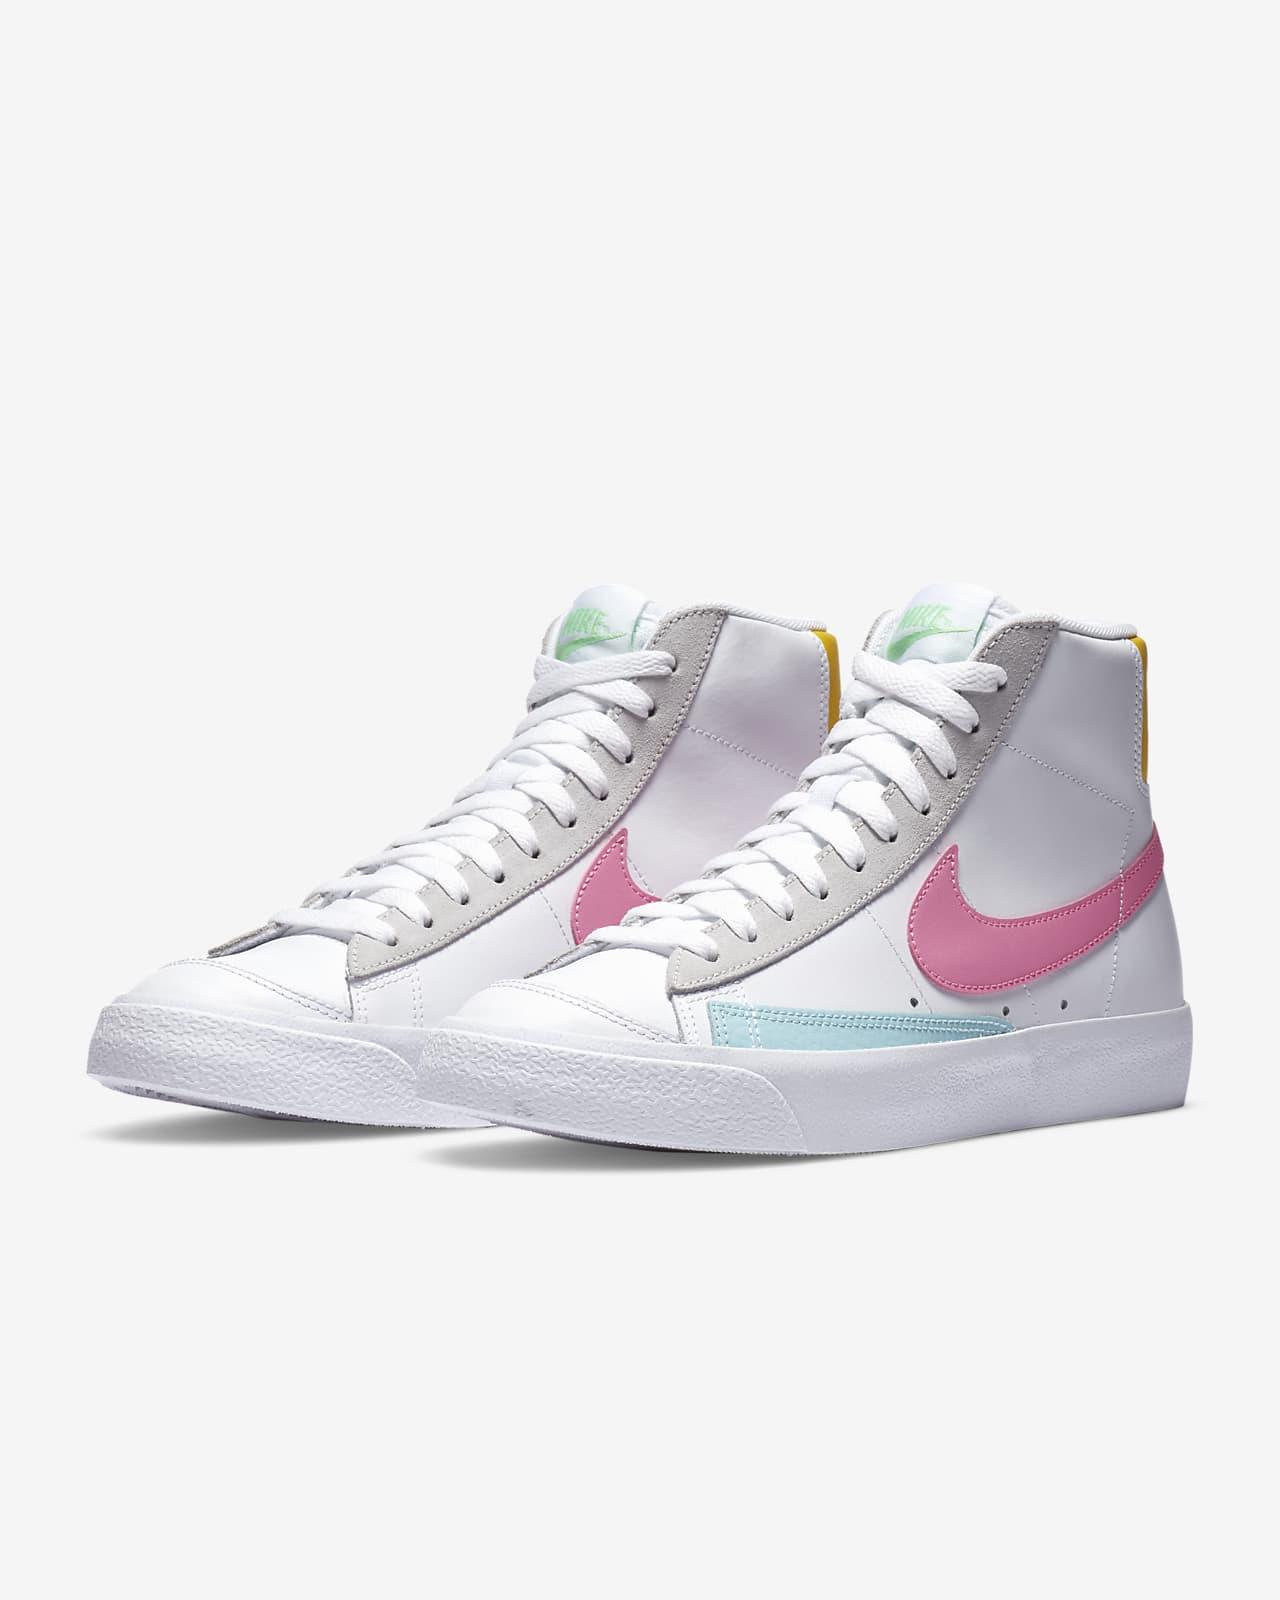 recoger juego granizo  Nike Blazer Mid Vintage '77 Women's Shoe. Nike SA